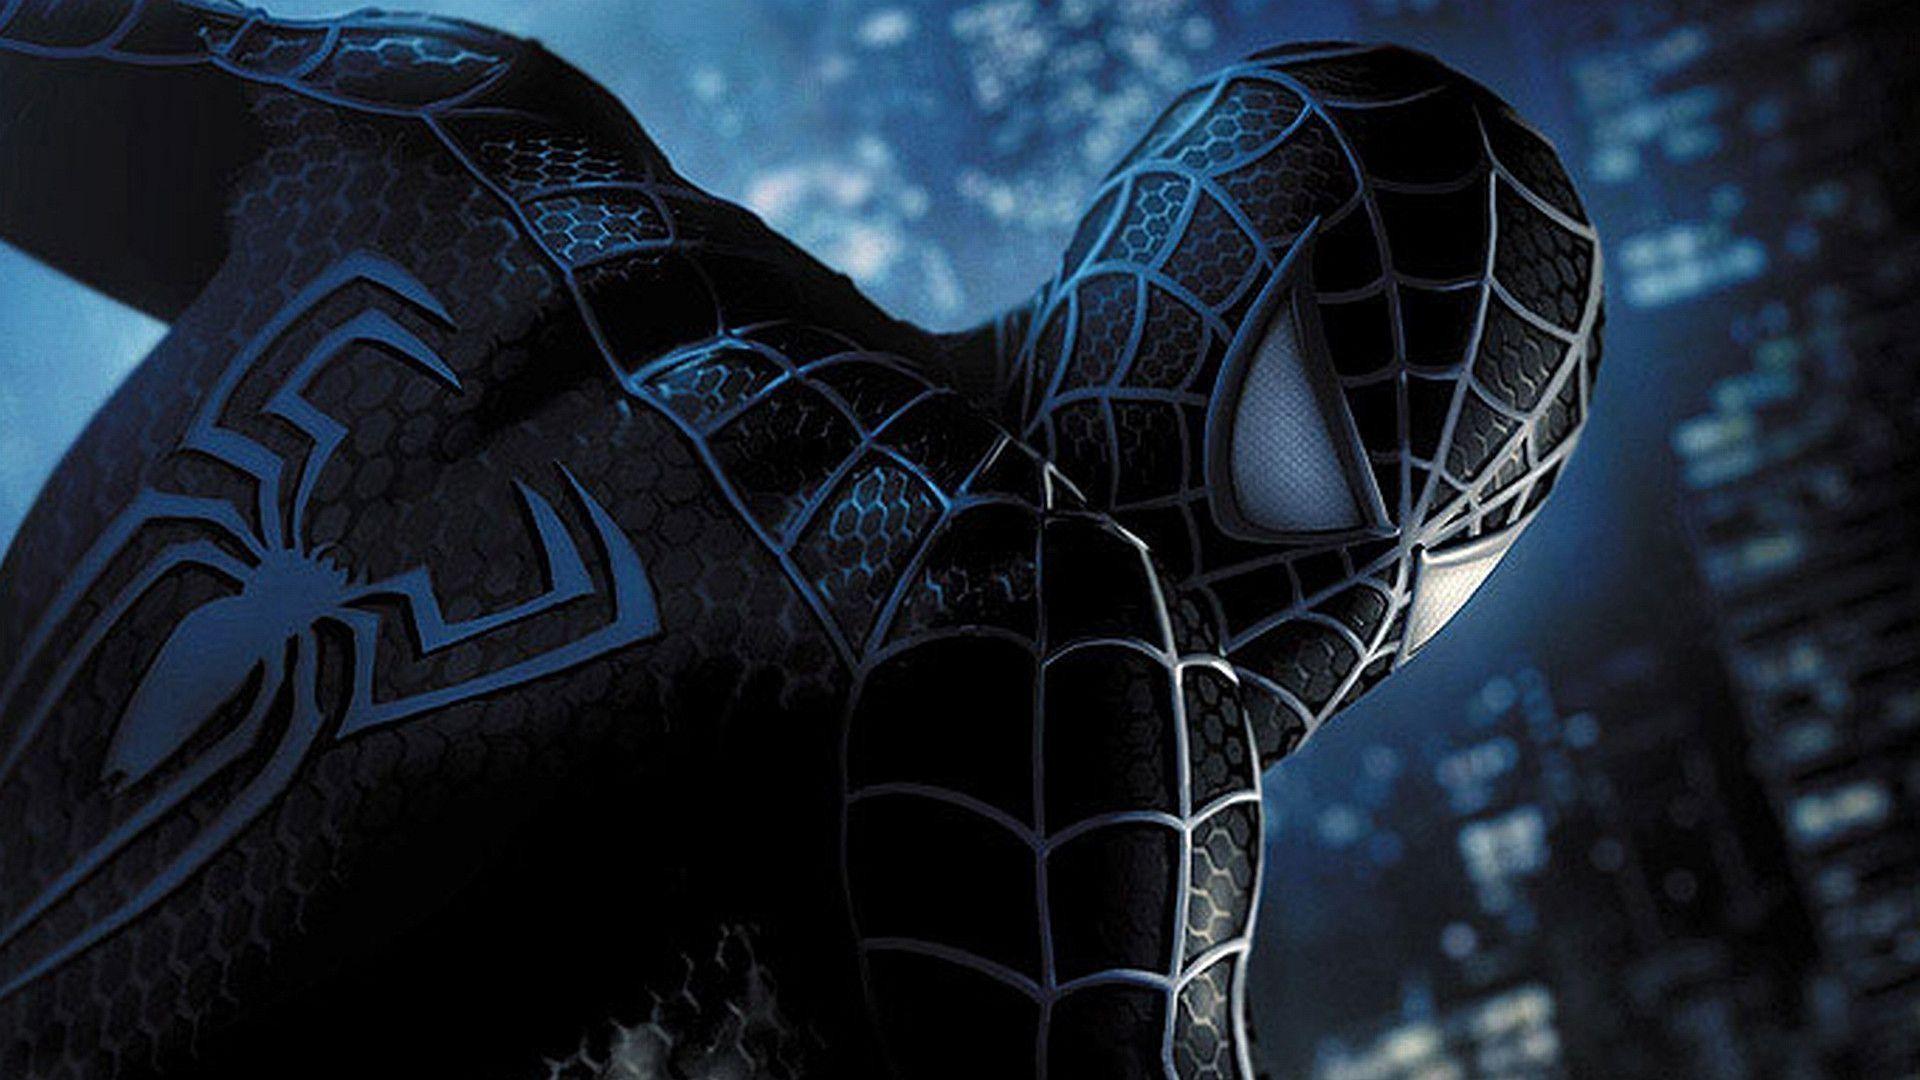 Spiderman 3 Wallpaper ①